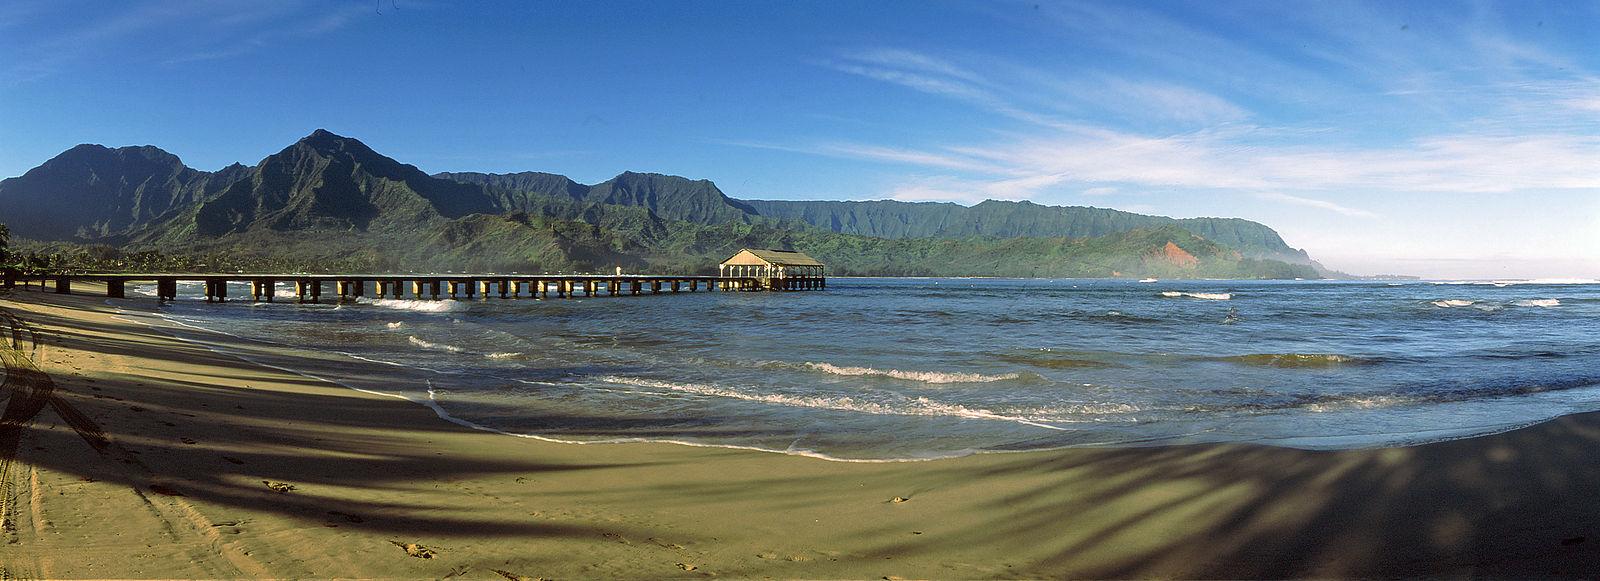 Hanalei_Bay_2_-_Kauai.jpg